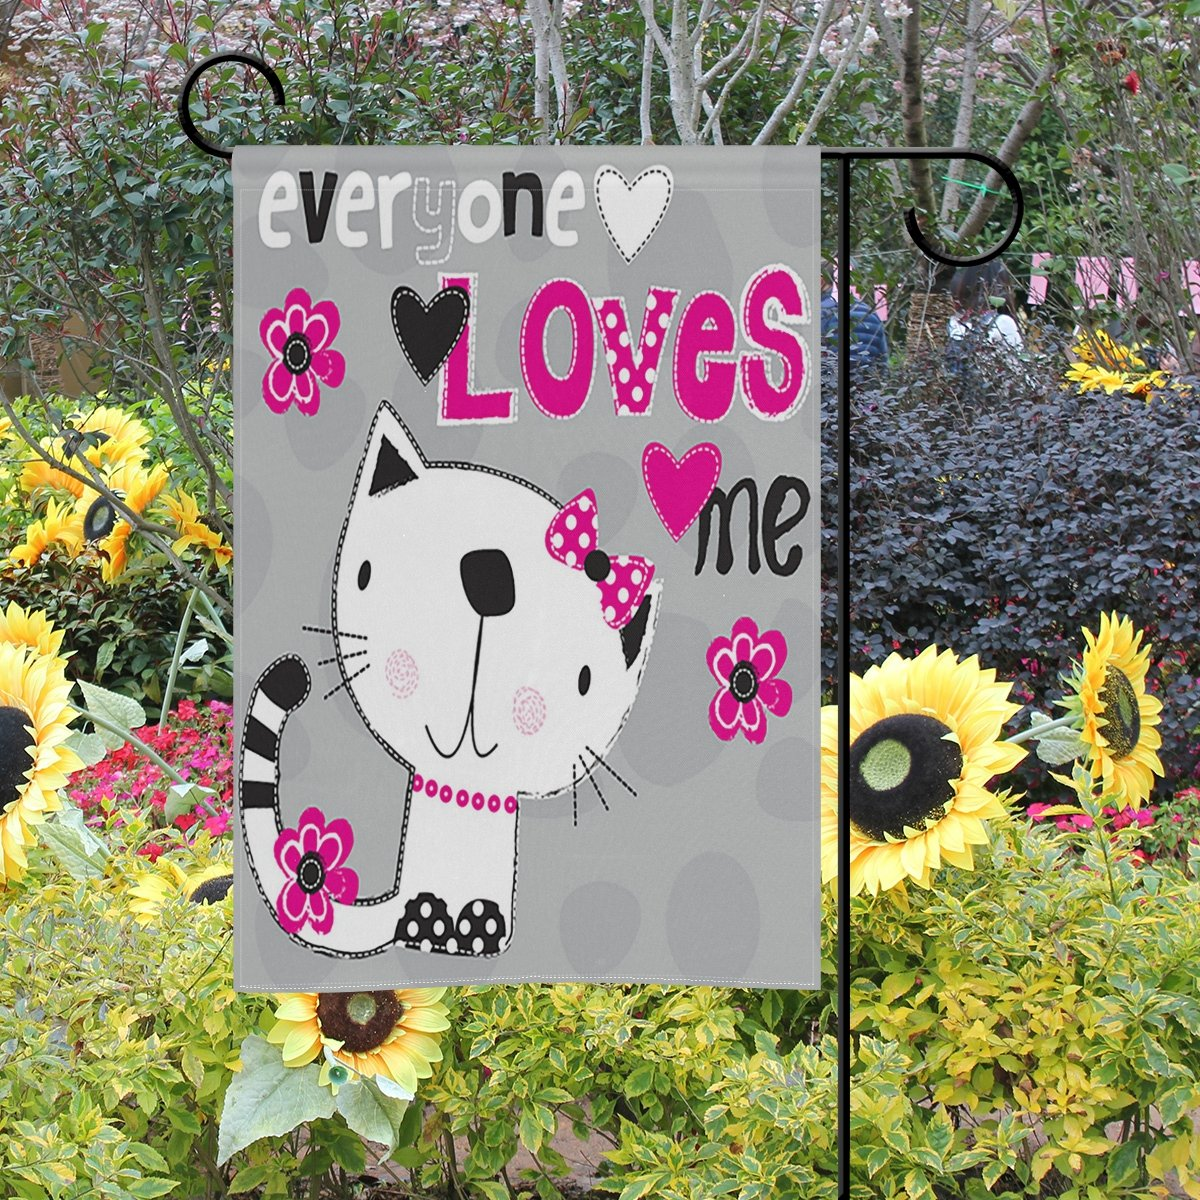 ShineSnow 30,48 x 45,72 cm Tela Bandera Decorativa de Doble Cara para jardín o Exterior Multicolor diseño de Gato con Texto en inglés Everyone Love Me in 12x18